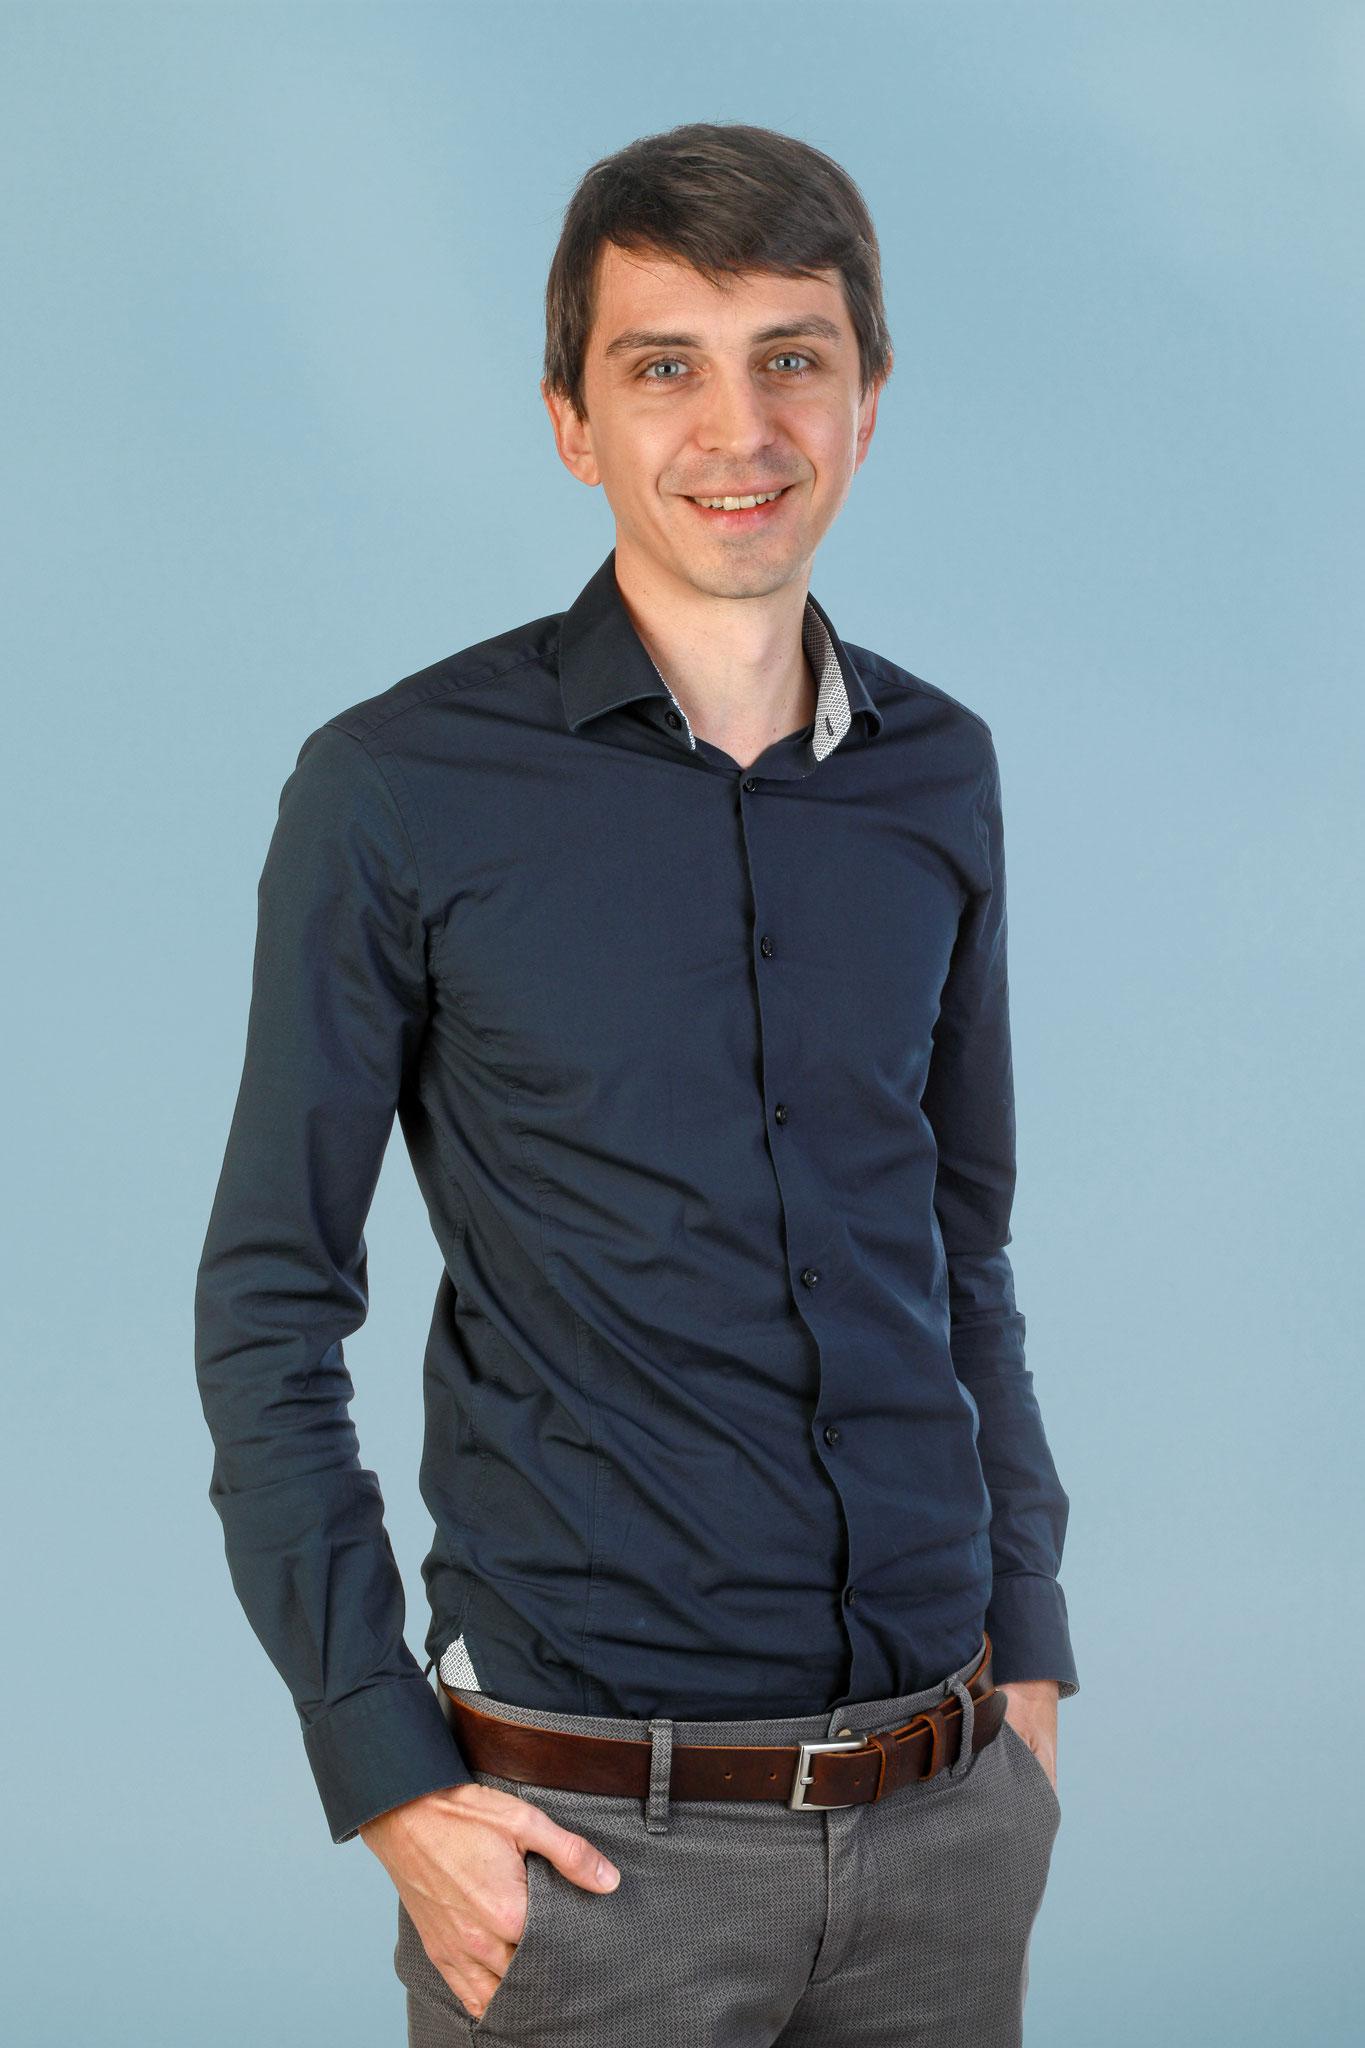 Kantonsratswahlen SP Liste 10 Thurgau Bezirk Arbon 15.03.2020 Portrait Kandidat